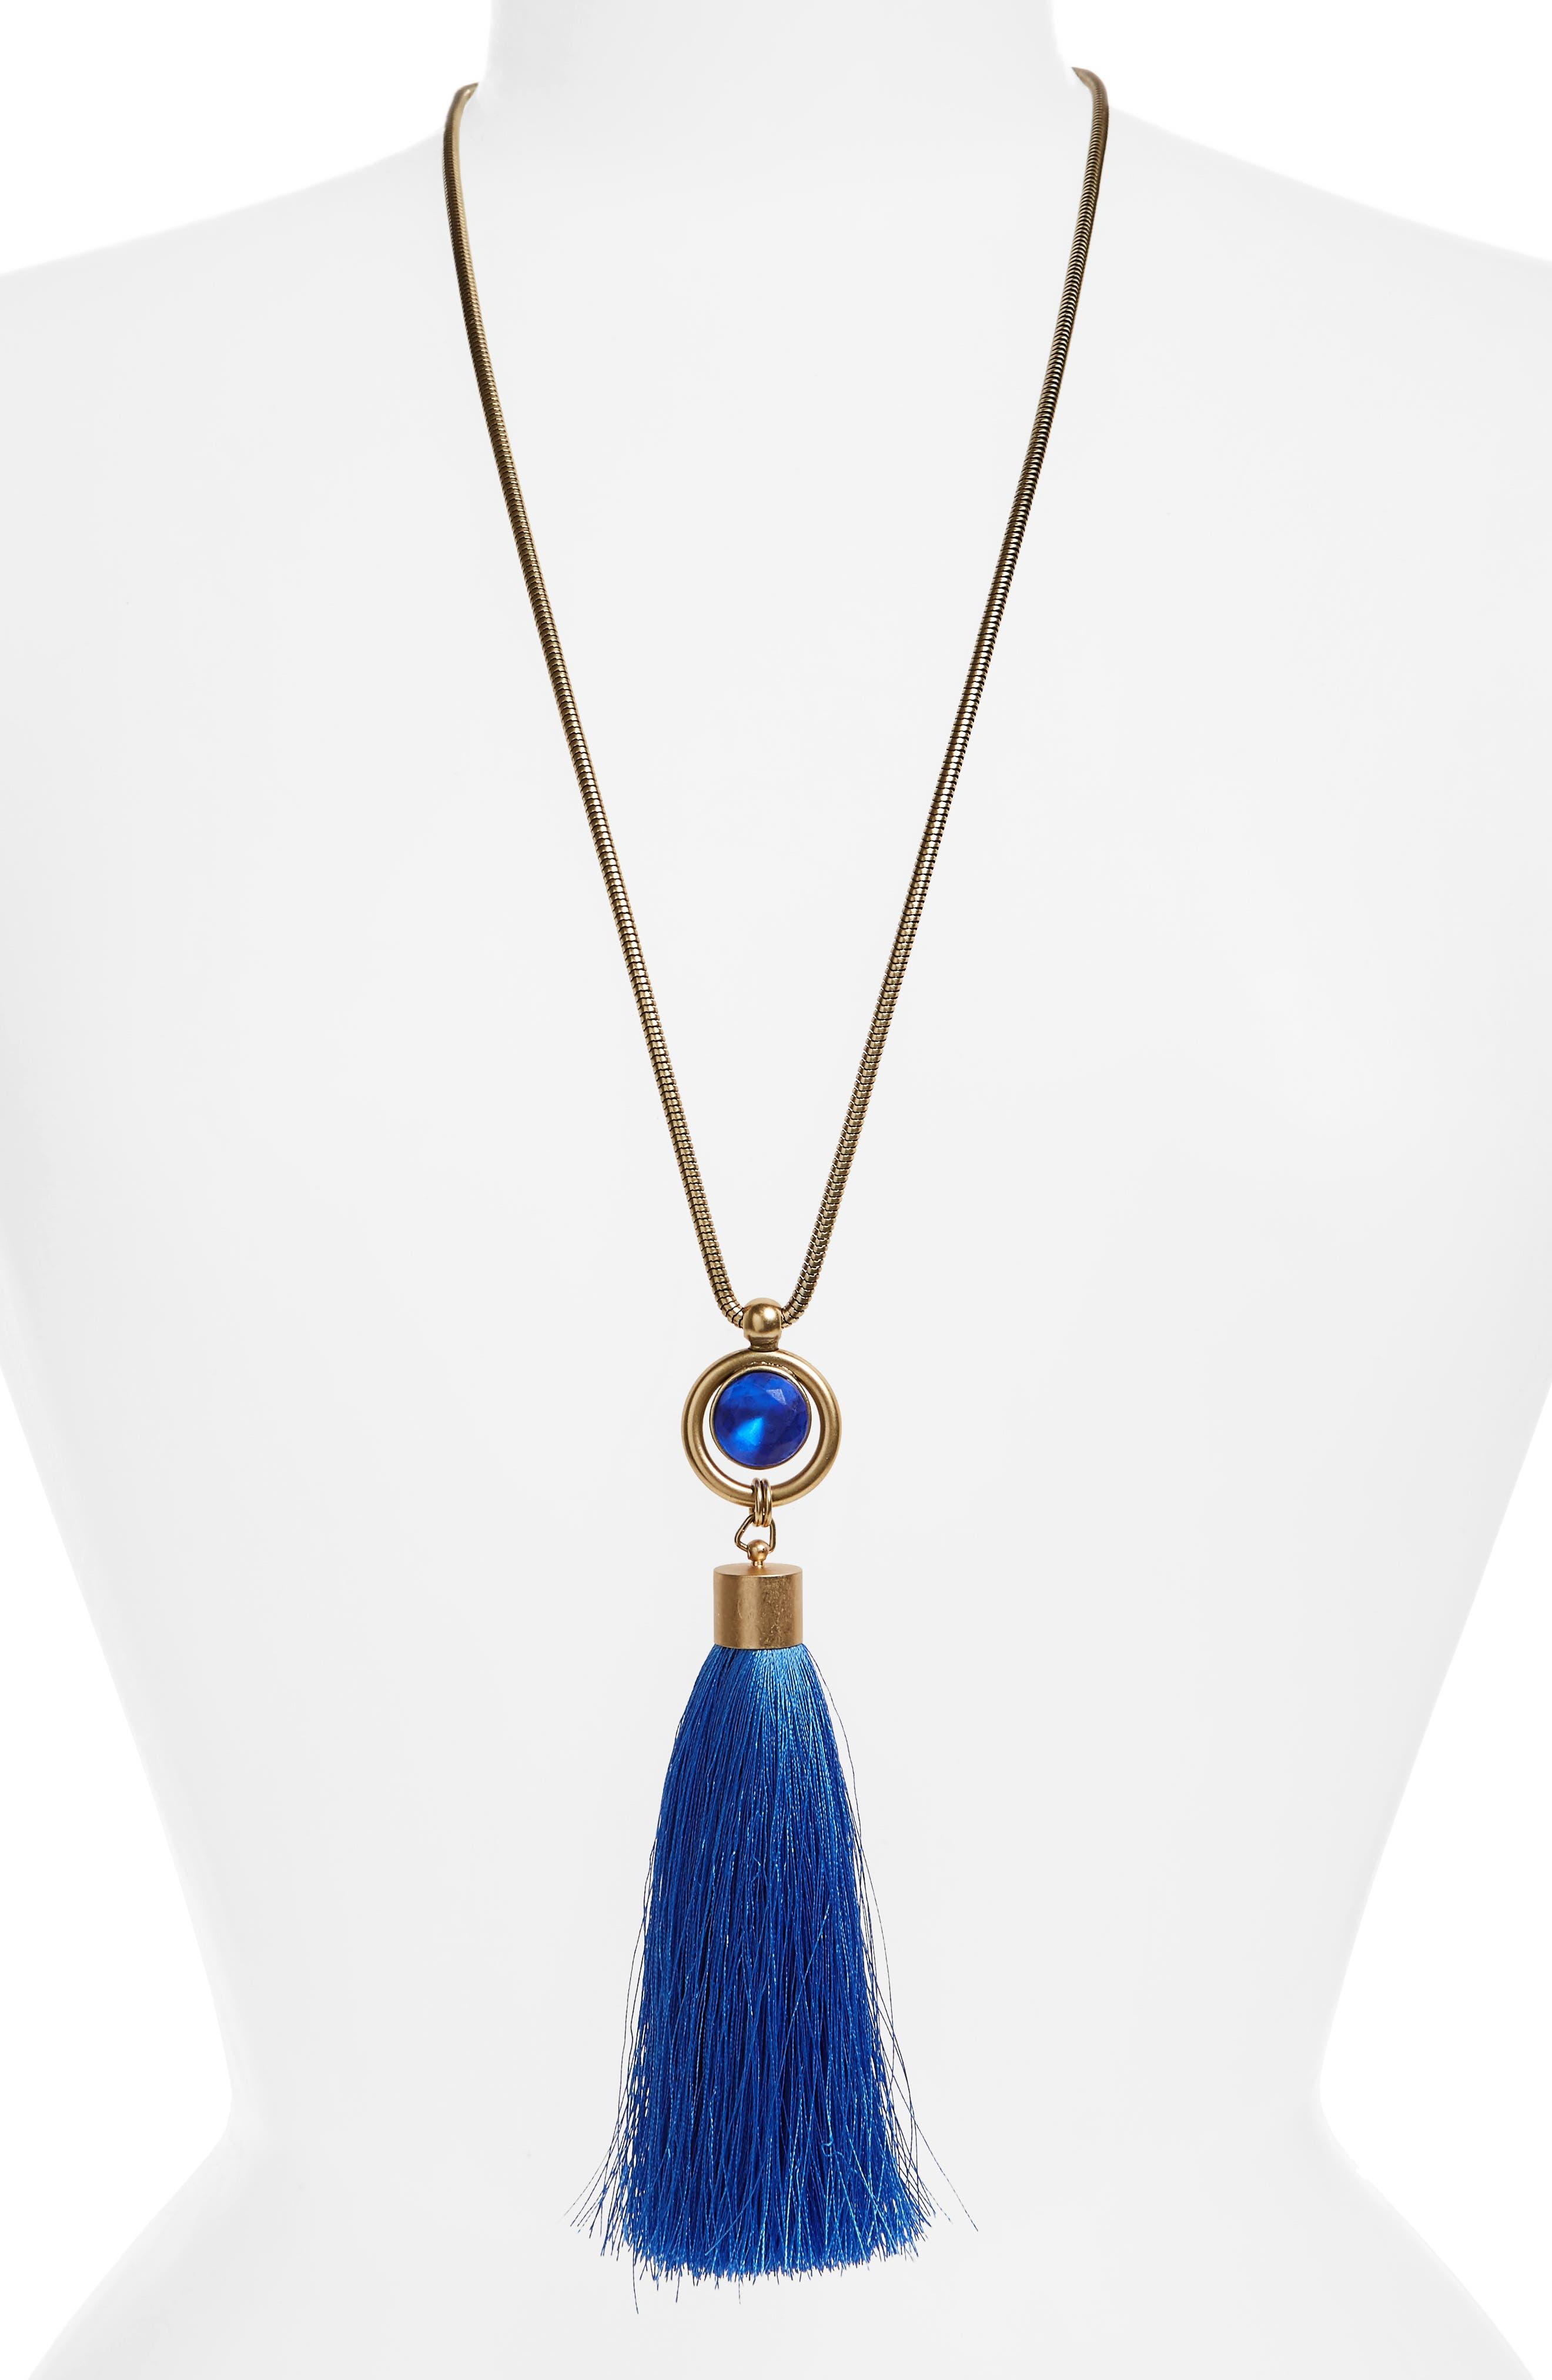 Alternate Image 1 Selected - Loren Hope Scarlet Tassel Pendant Necklace